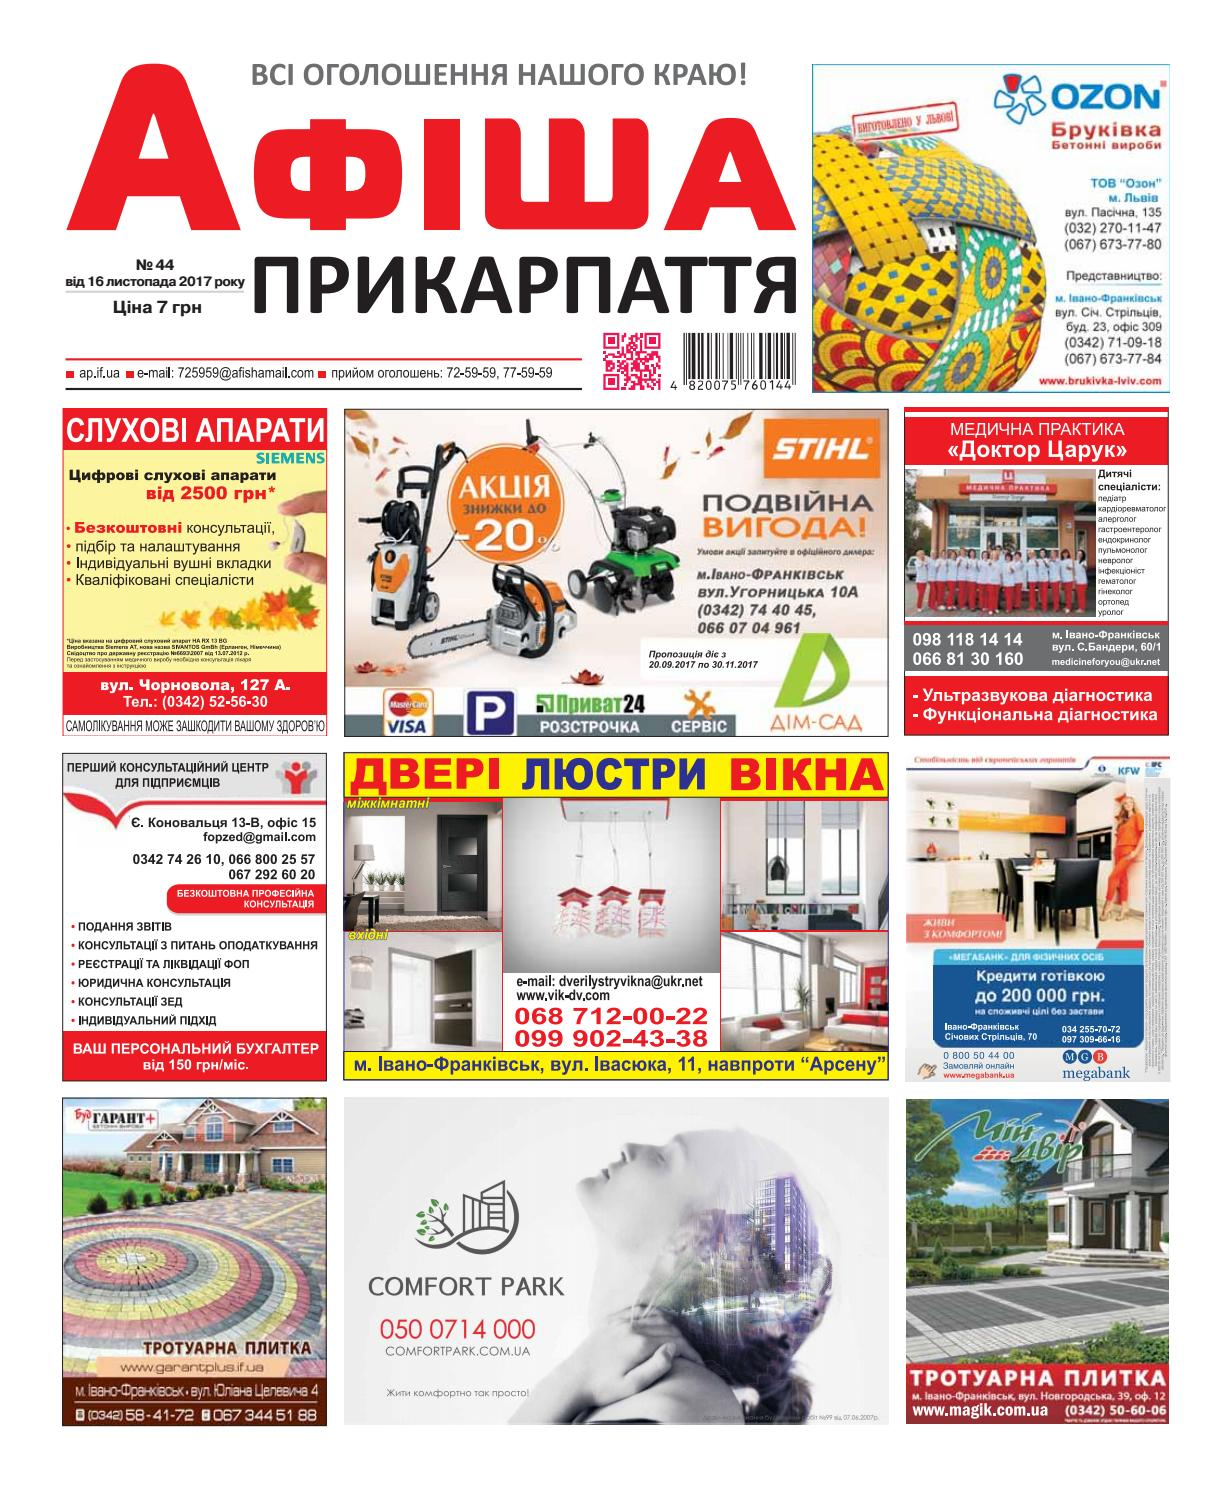 Афіша Прикарпаття 44 by Olya Olya - issuu 2065246b8b949